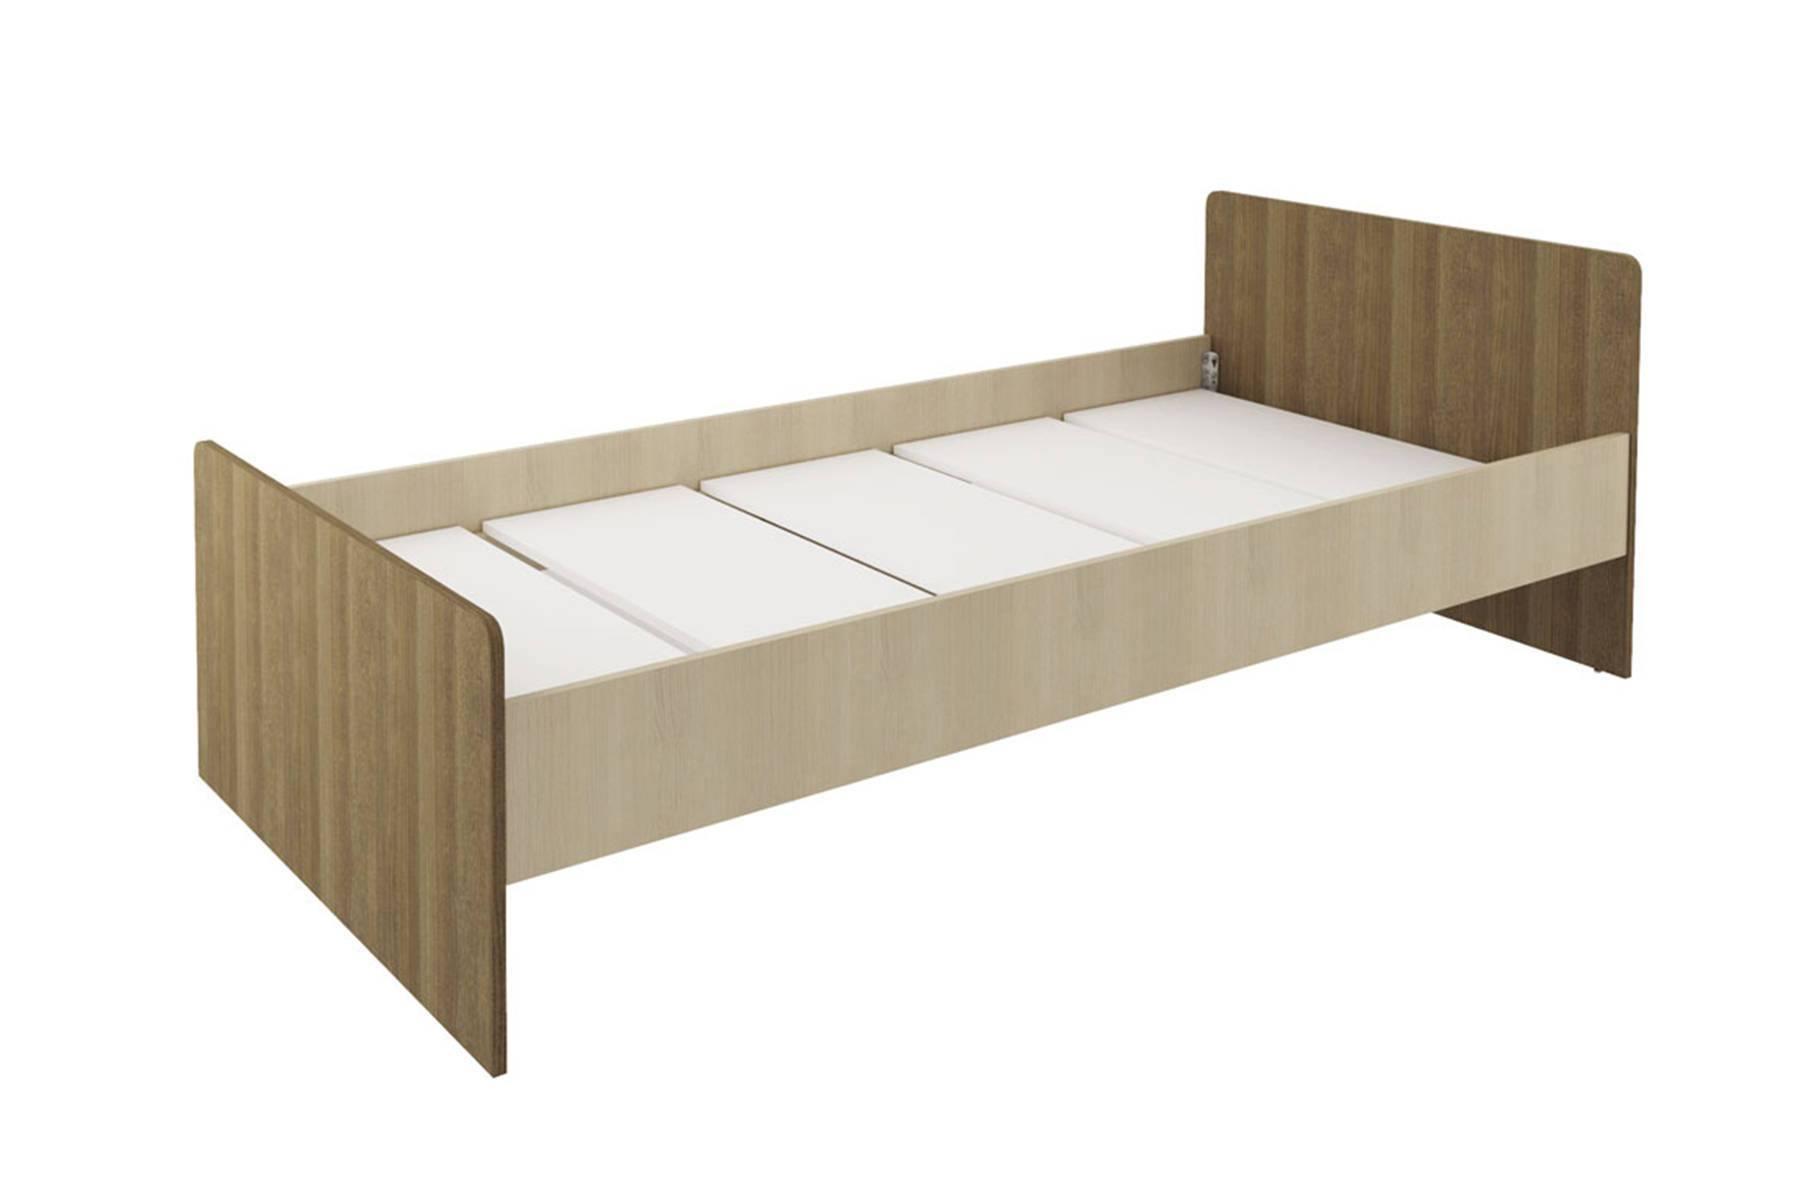 цена на Кровать Мика СТЛ.121.01-01